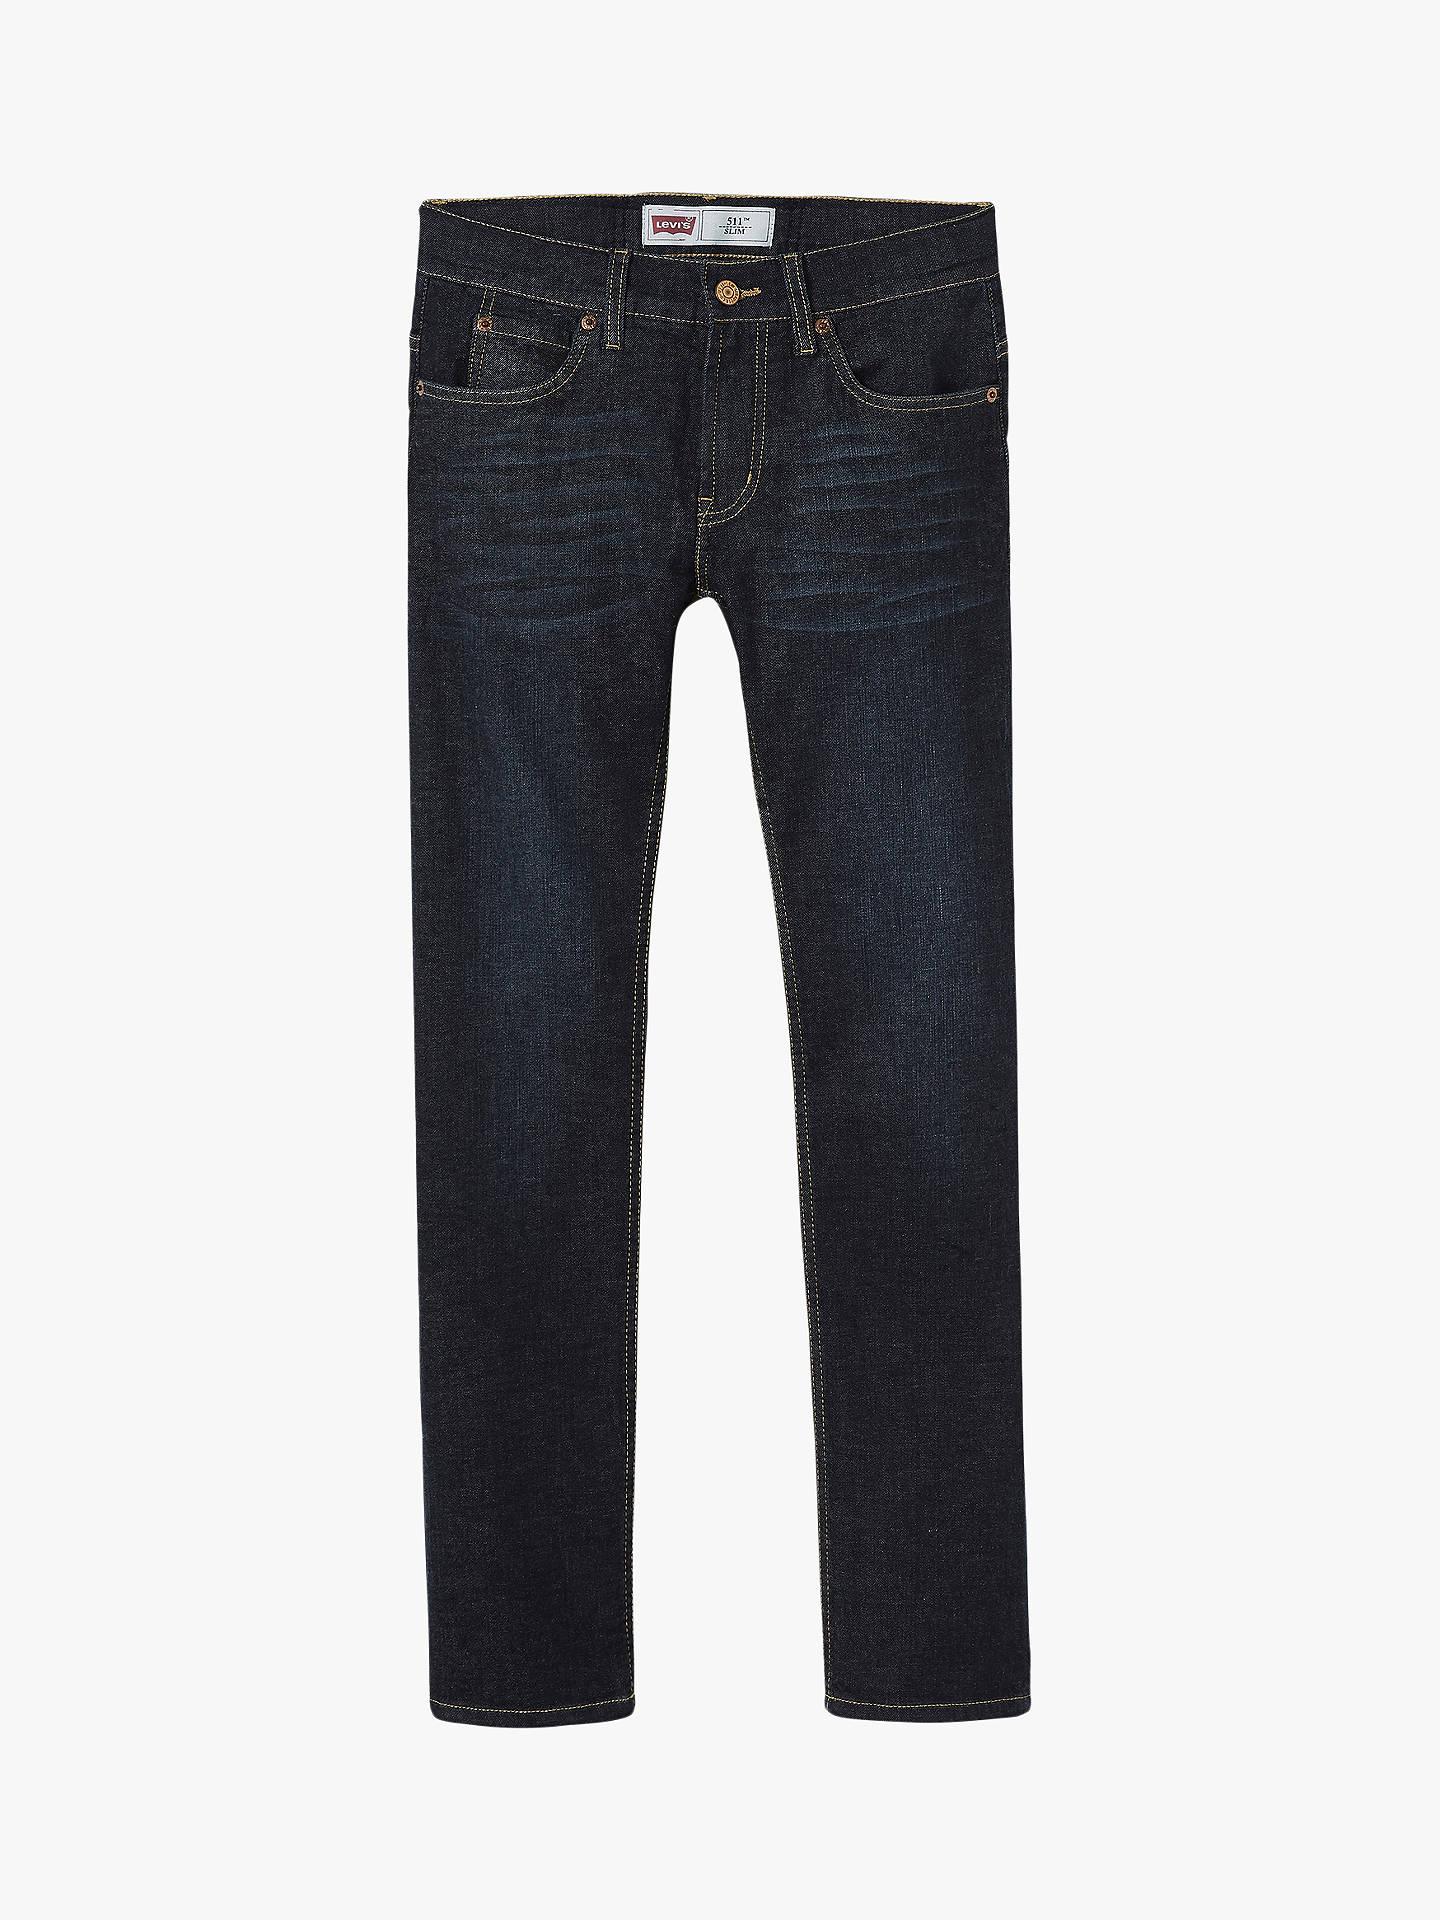 9b8da2076 Buy Levi's Boys' 511 Slim Fit Jeans, Dark Wash, 6 years Online at ...